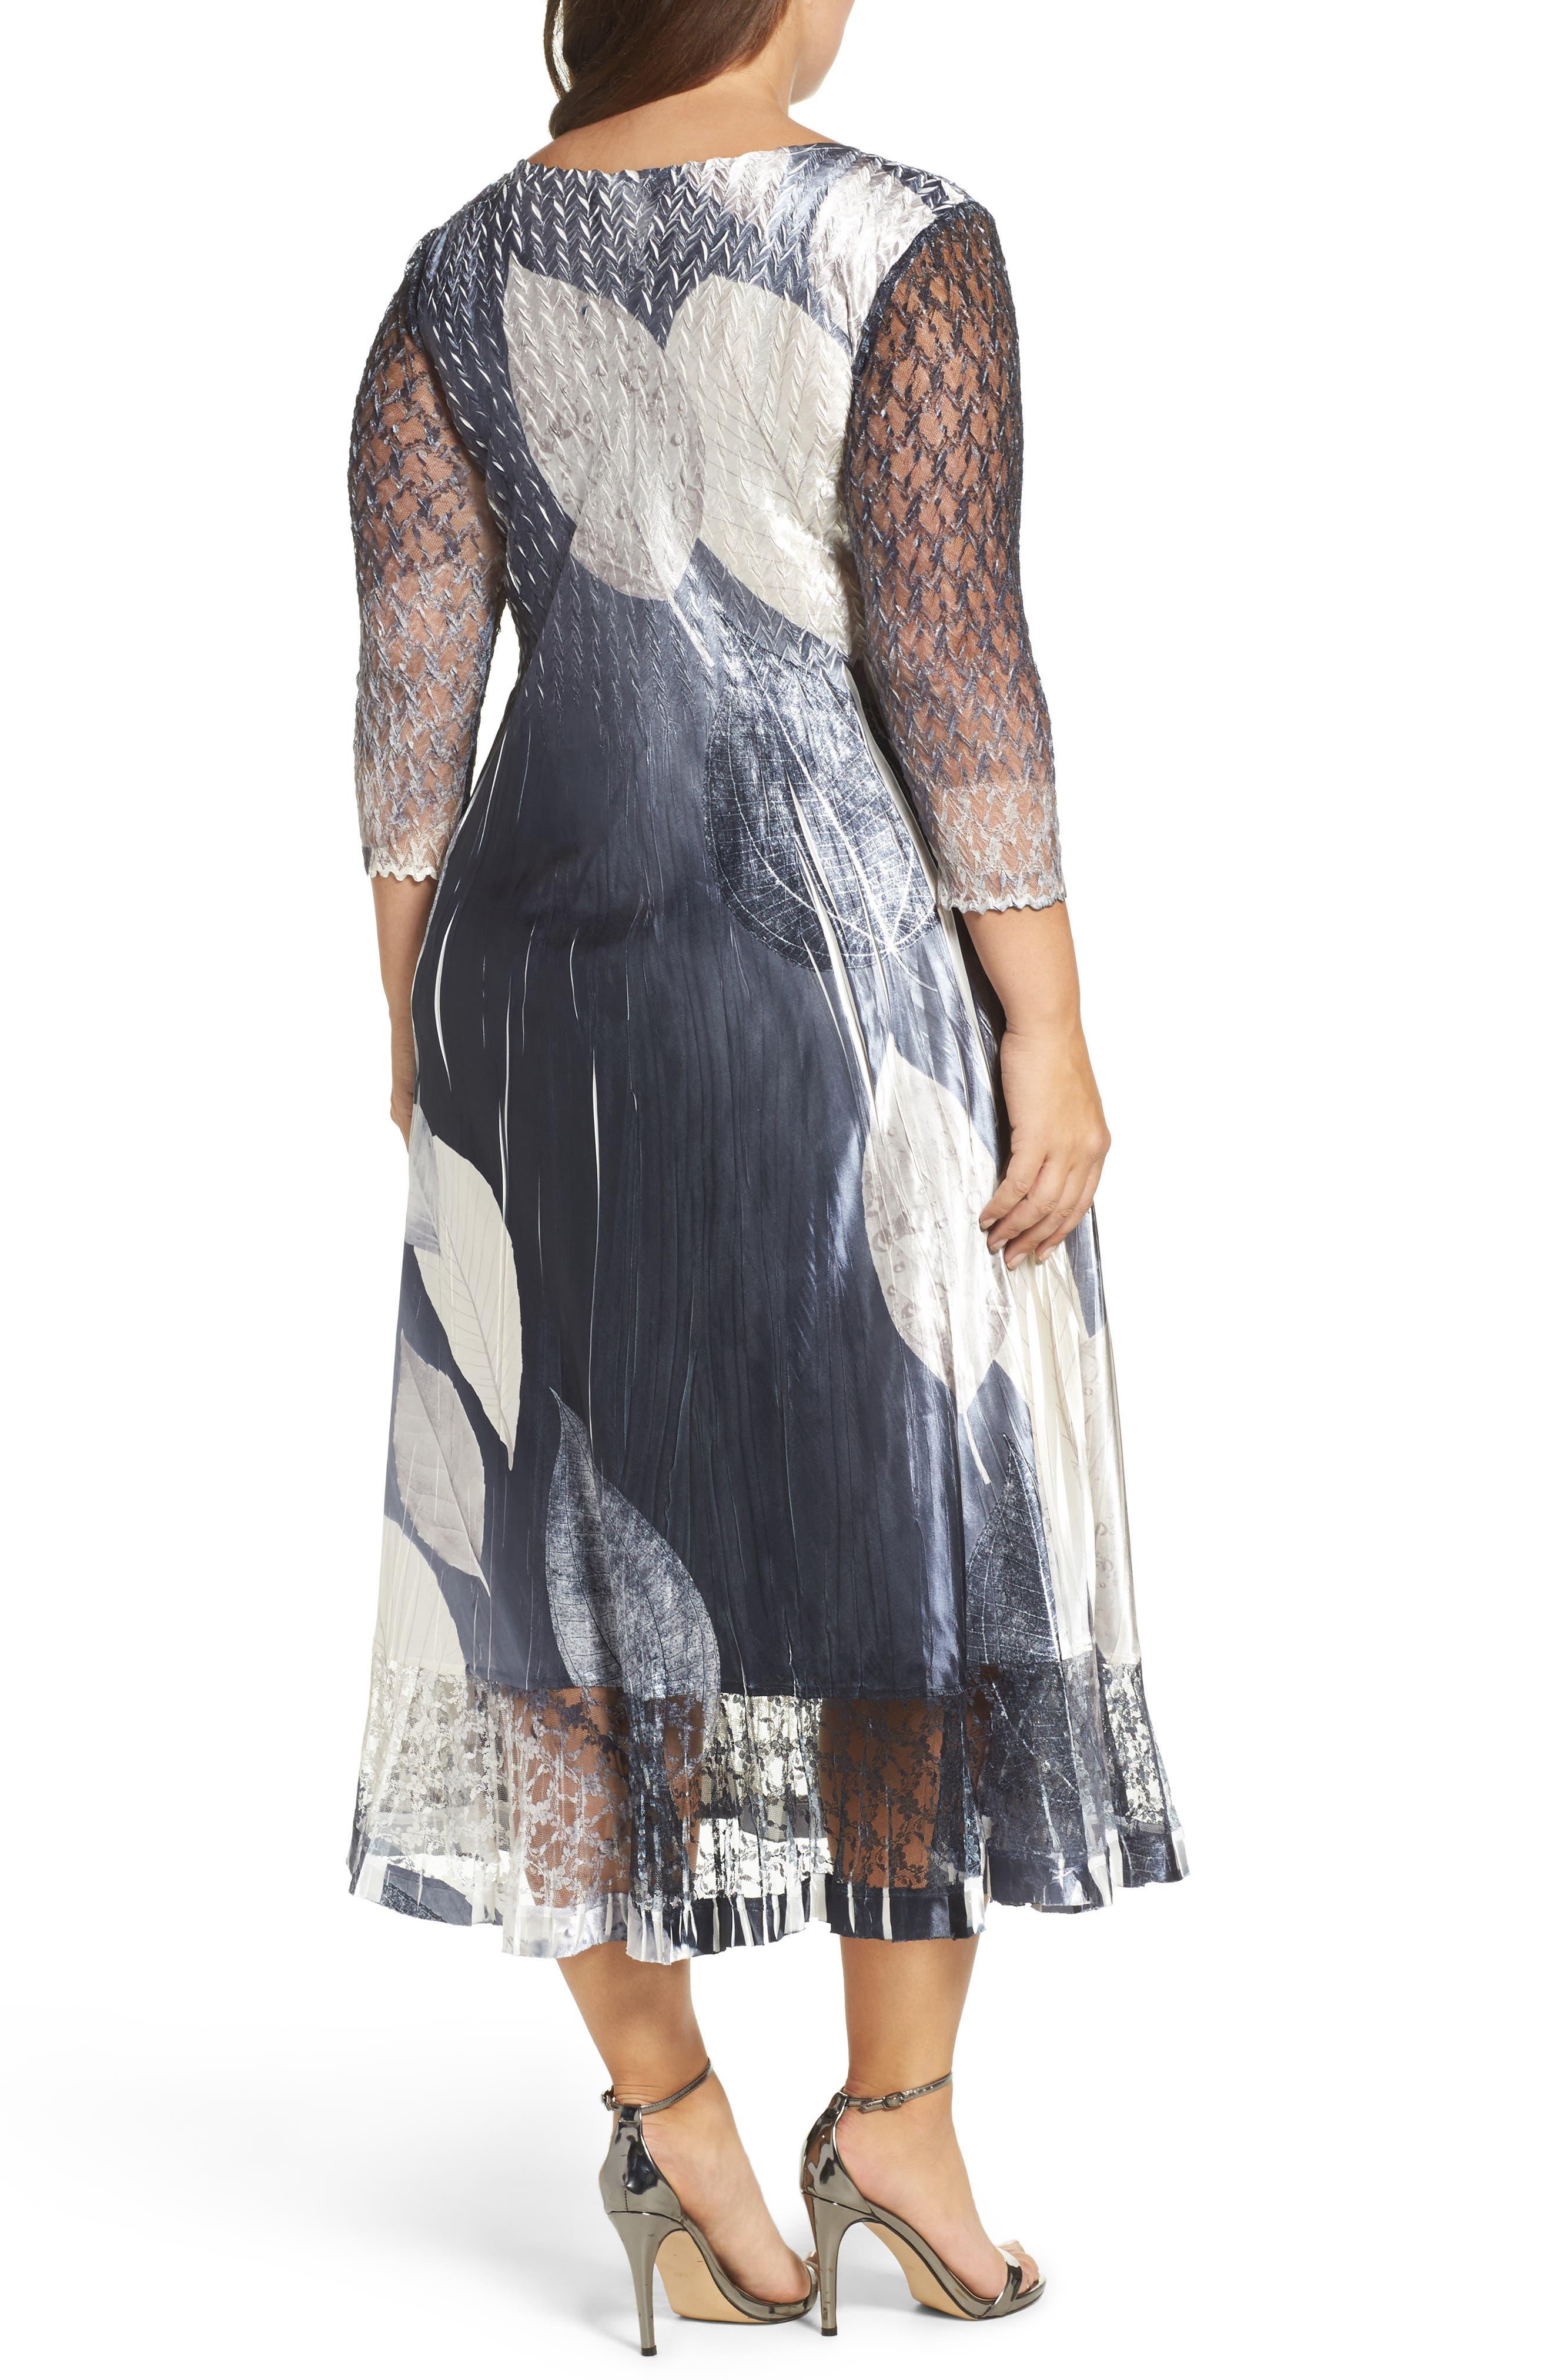 KOMAROV, Mixed Media Midi Dress, Alternate thumbnail 2, color, BLACK MONEY LEAVES